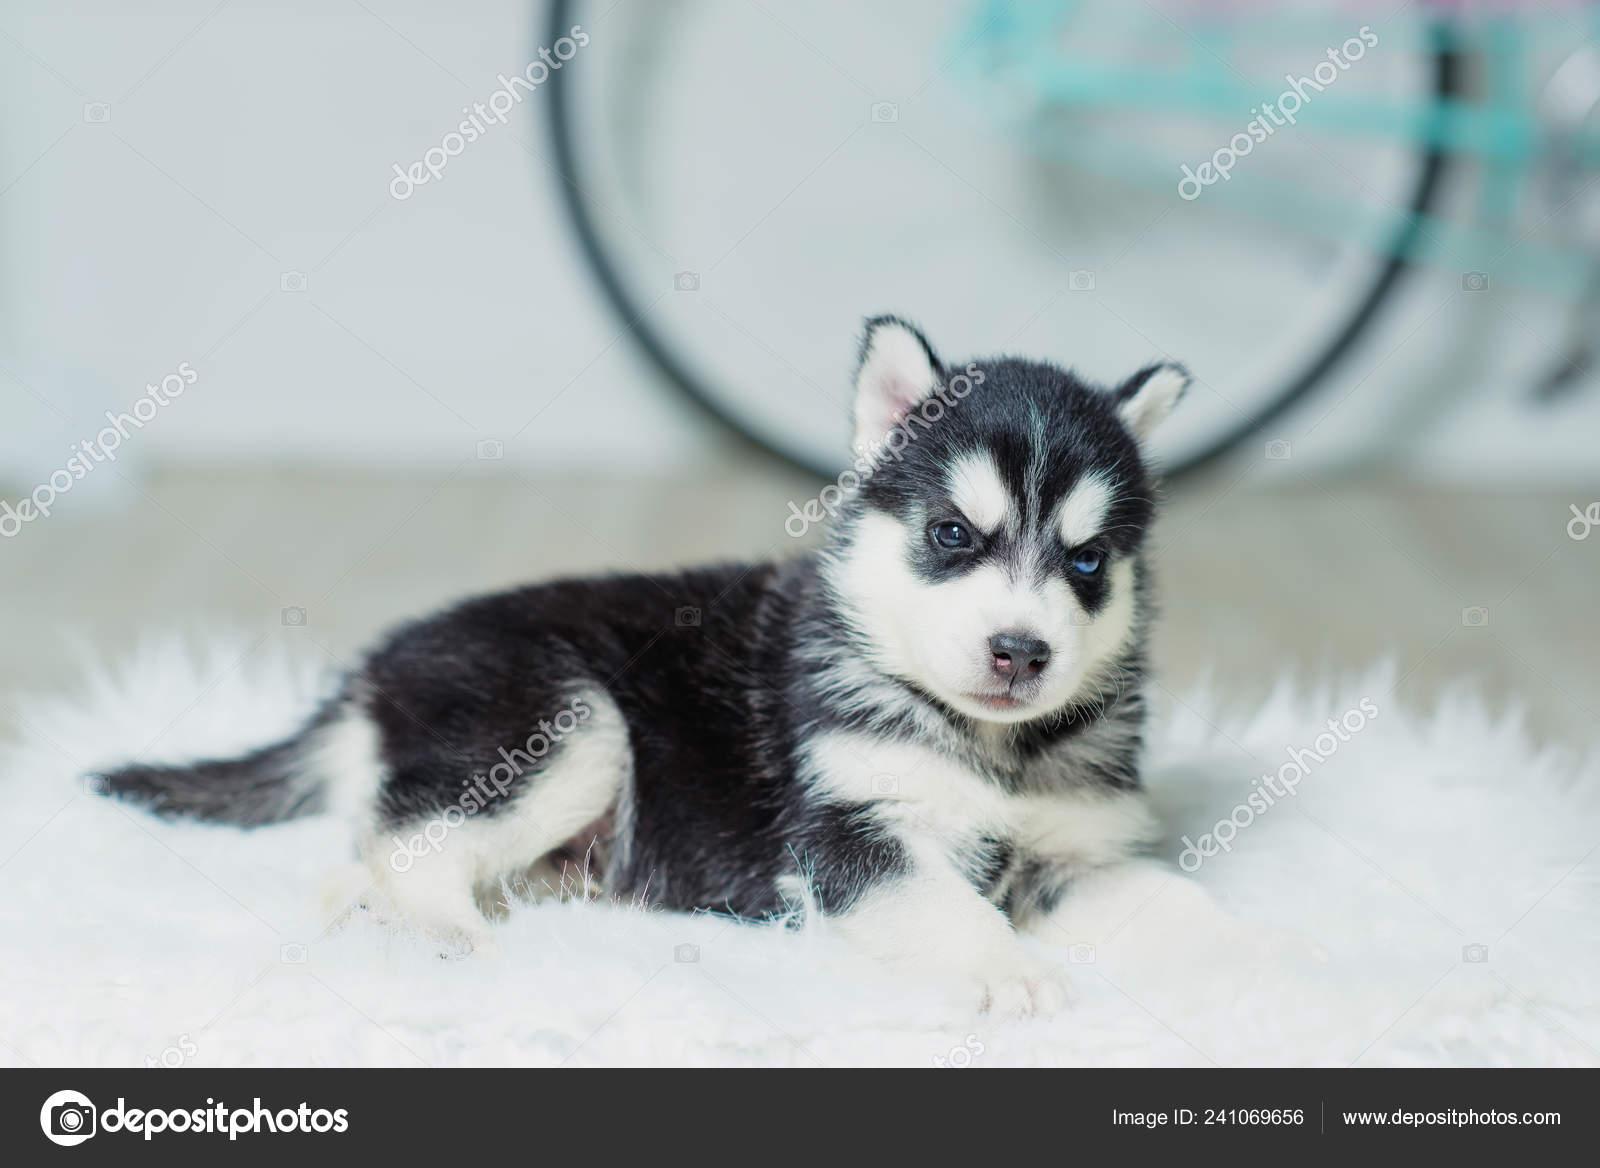 Husky Puppy Sitting White Wall Background Puppy Black White Color Stock Photo C Kinderkz 241069656